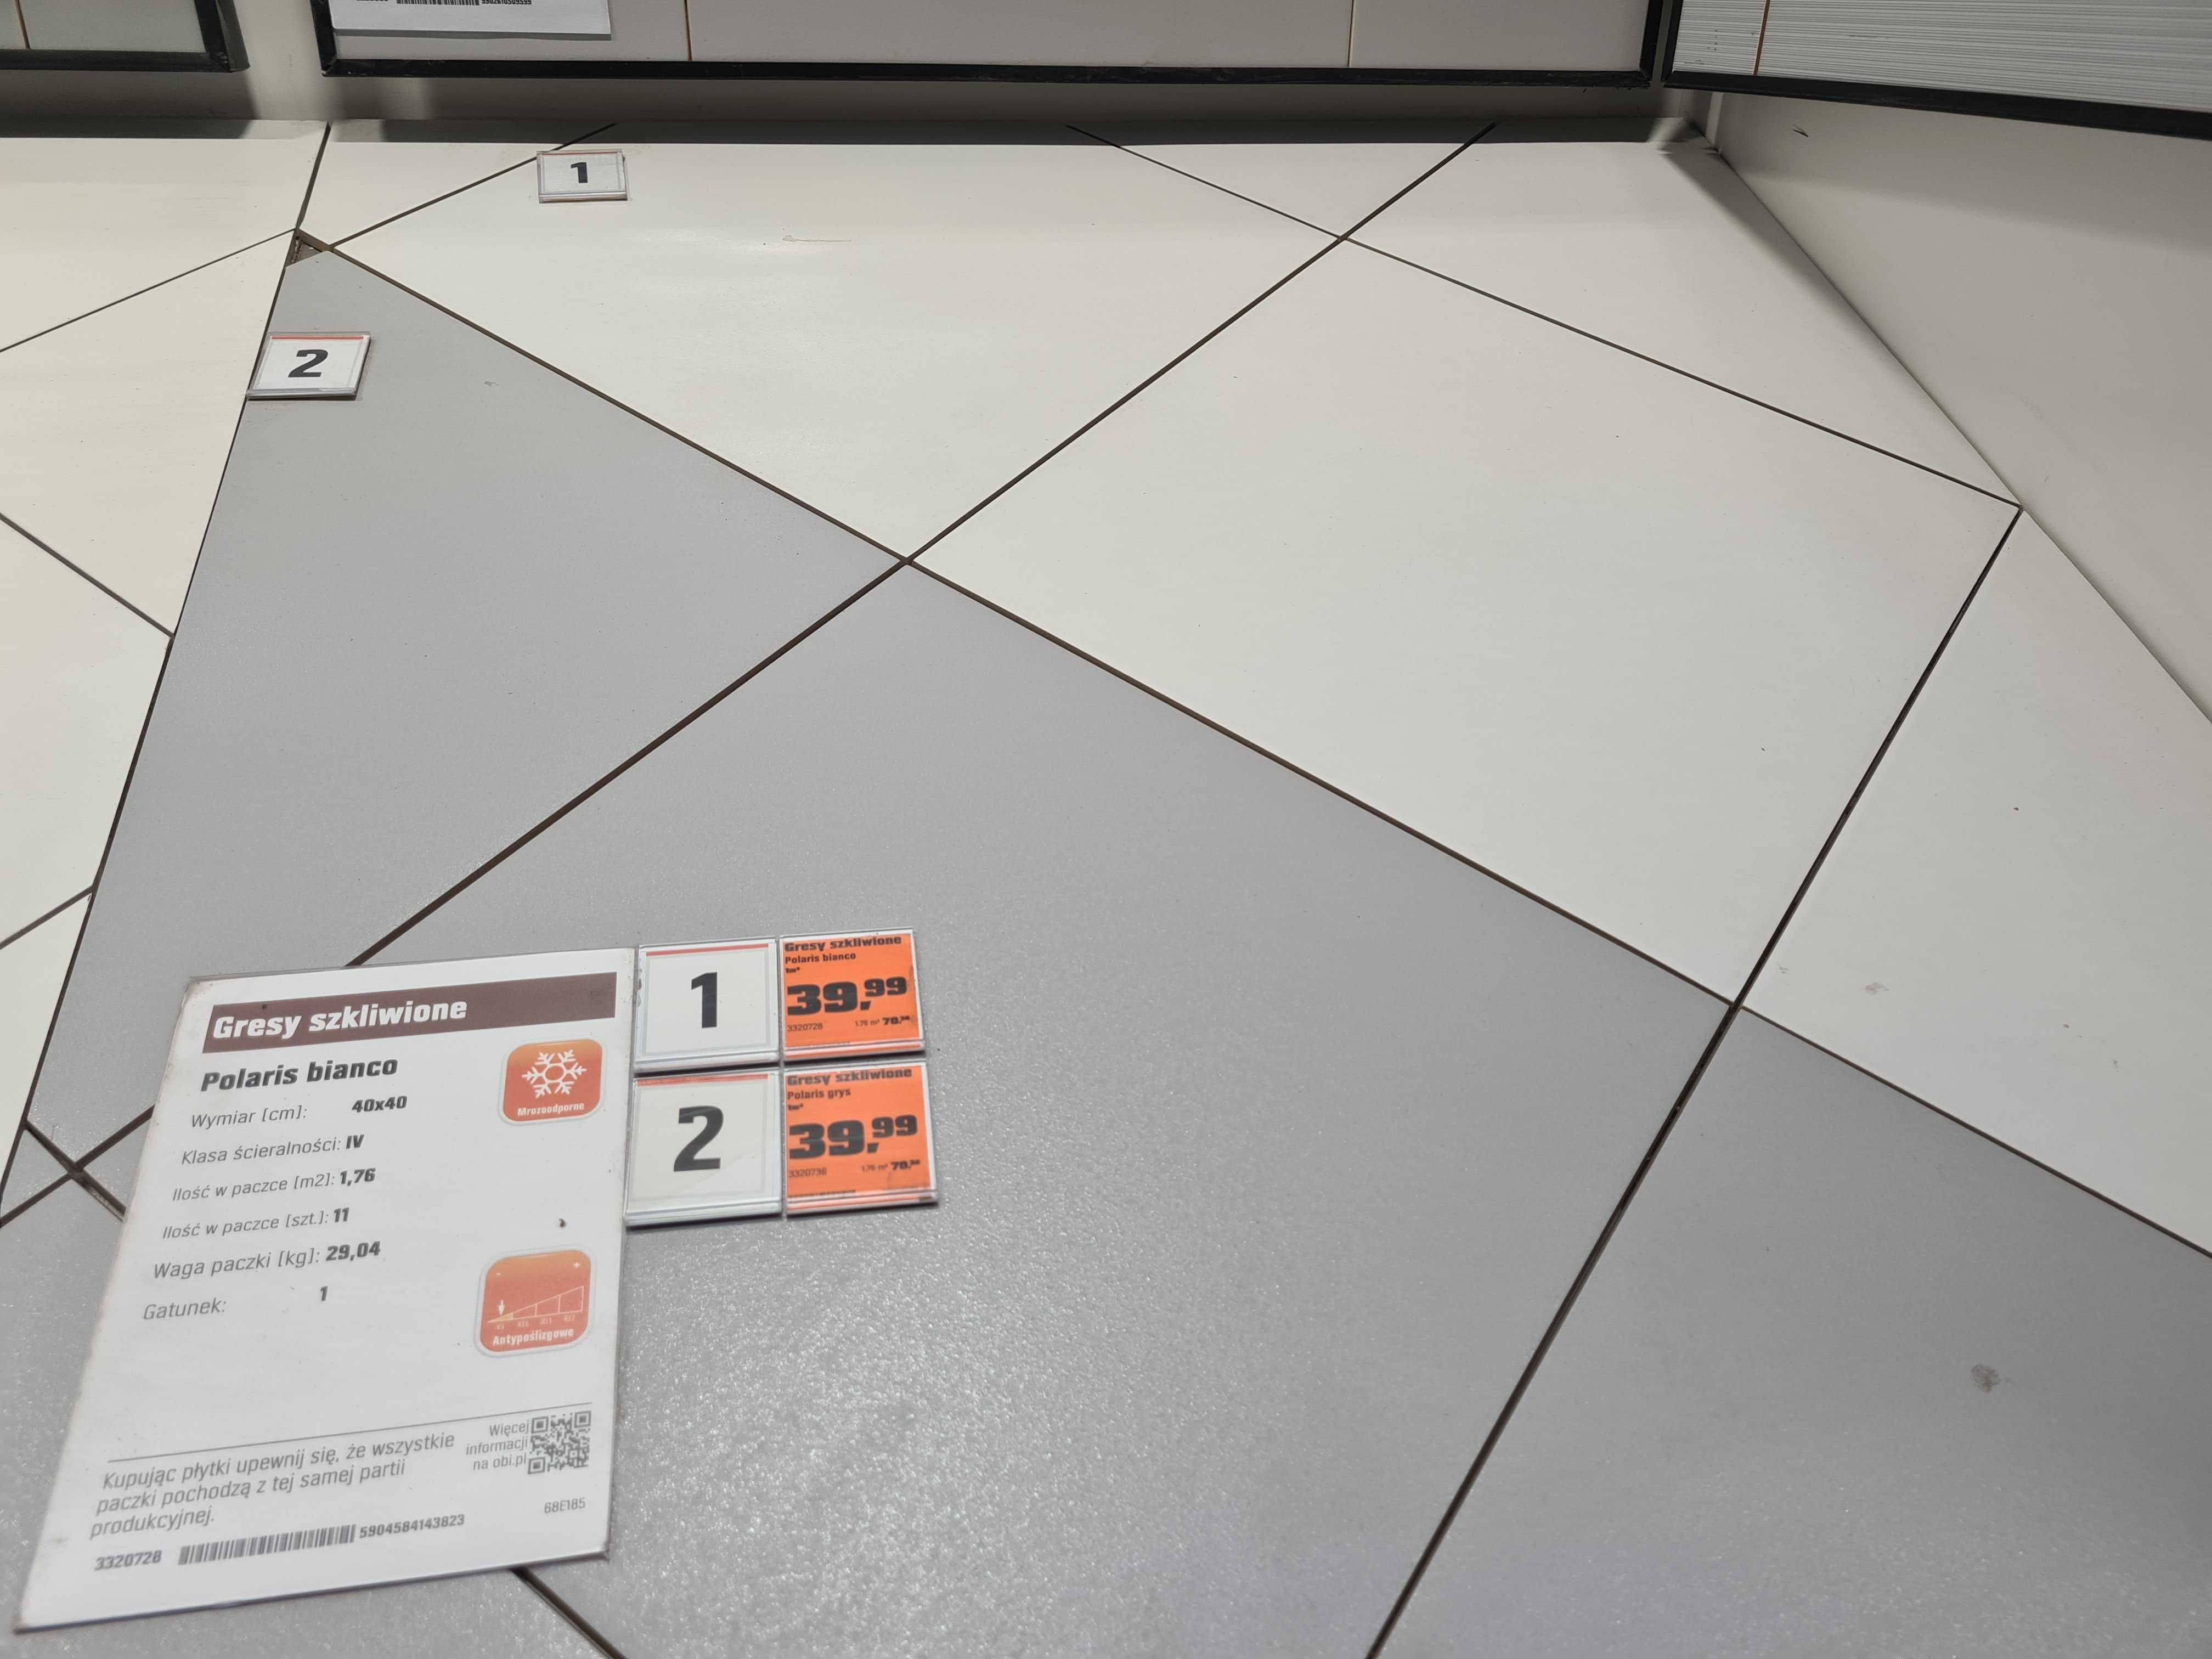 OBI Gres Polaris Bianco/Grys 1,76m2  / 39,98m2 -> 29,97m2